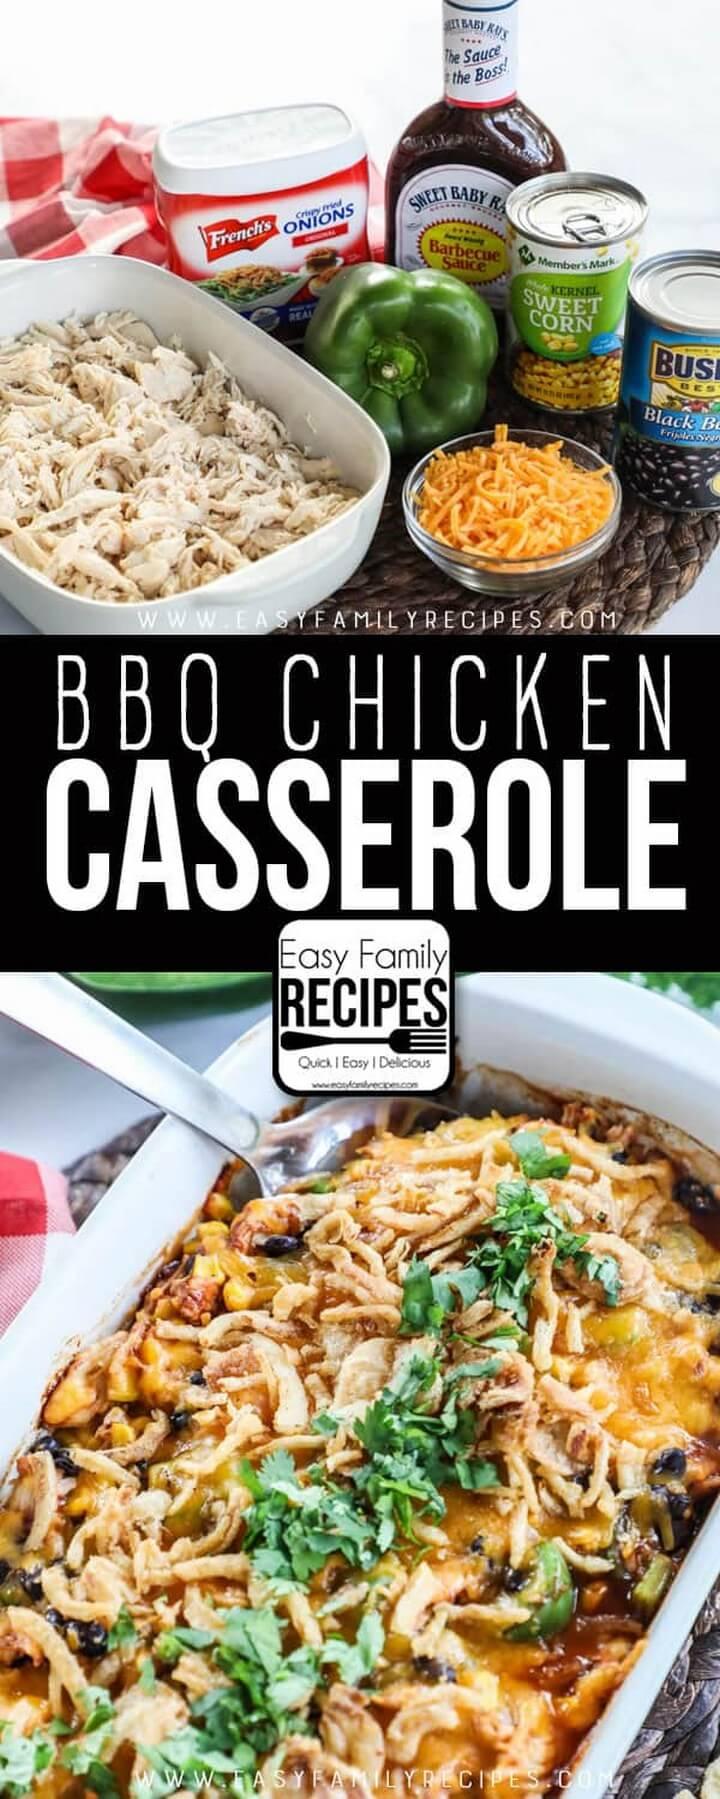 Shredded BBQ Chicken Casserole